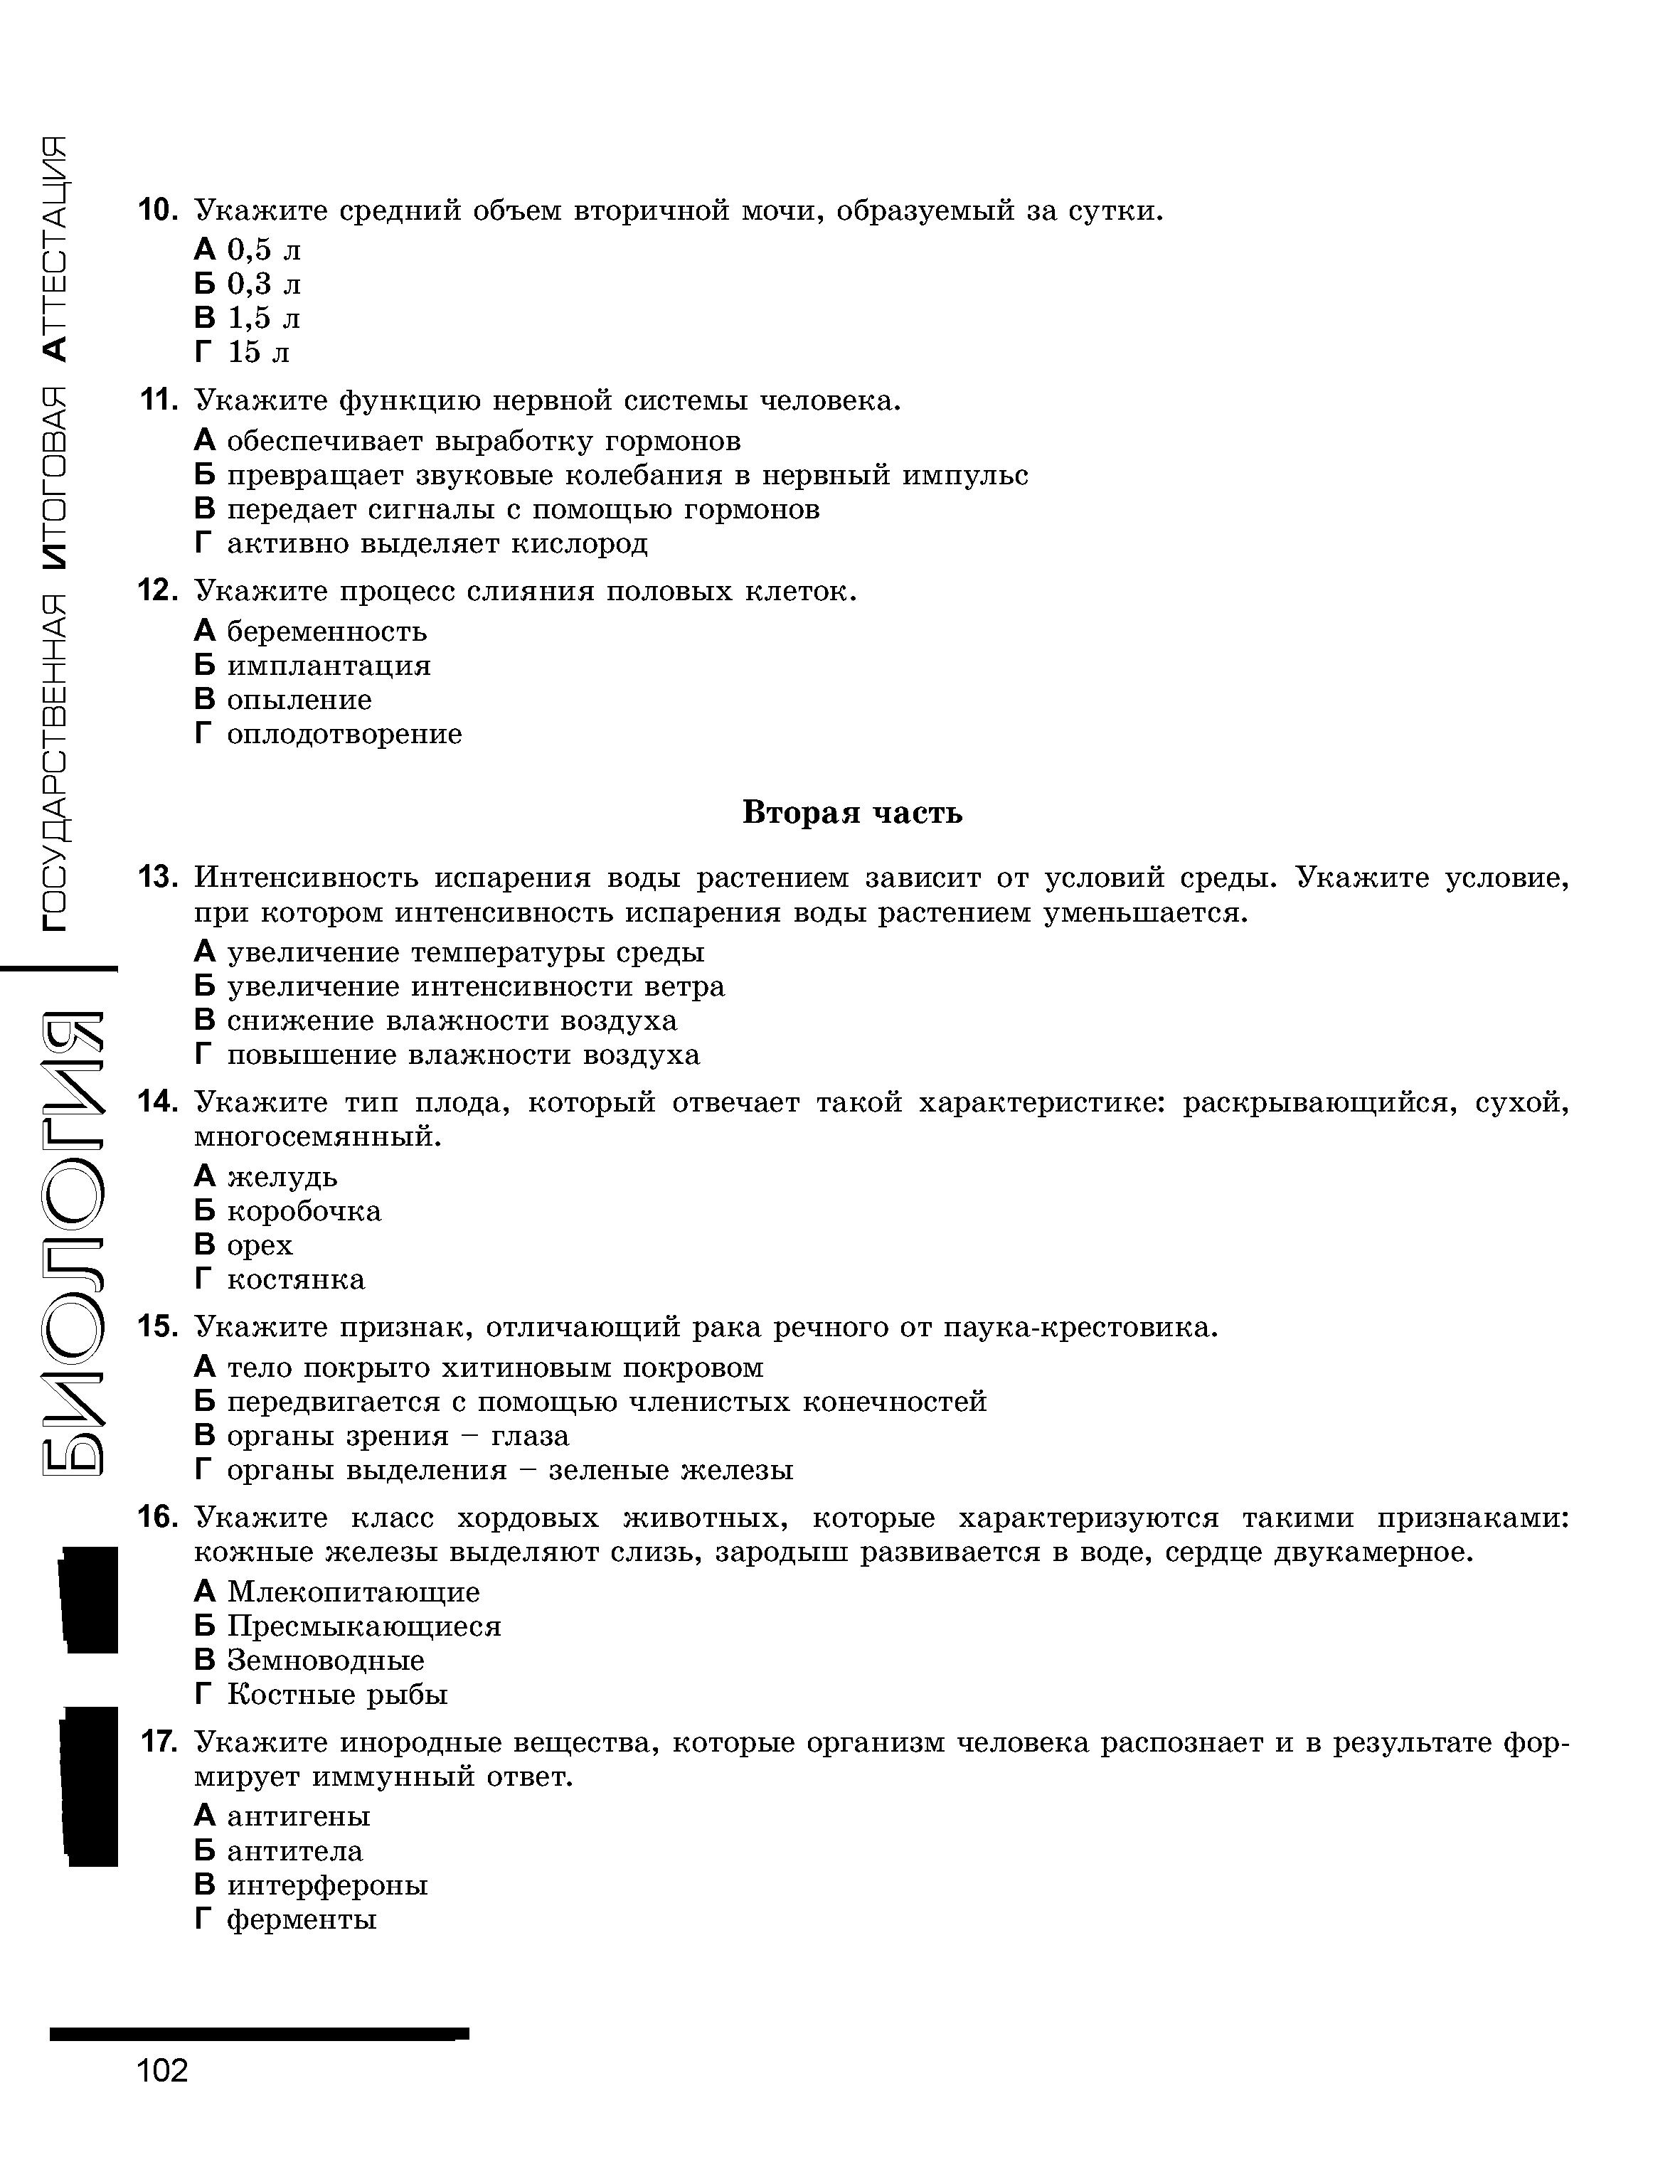 Решебник Дпа По Биологии 9 Клас